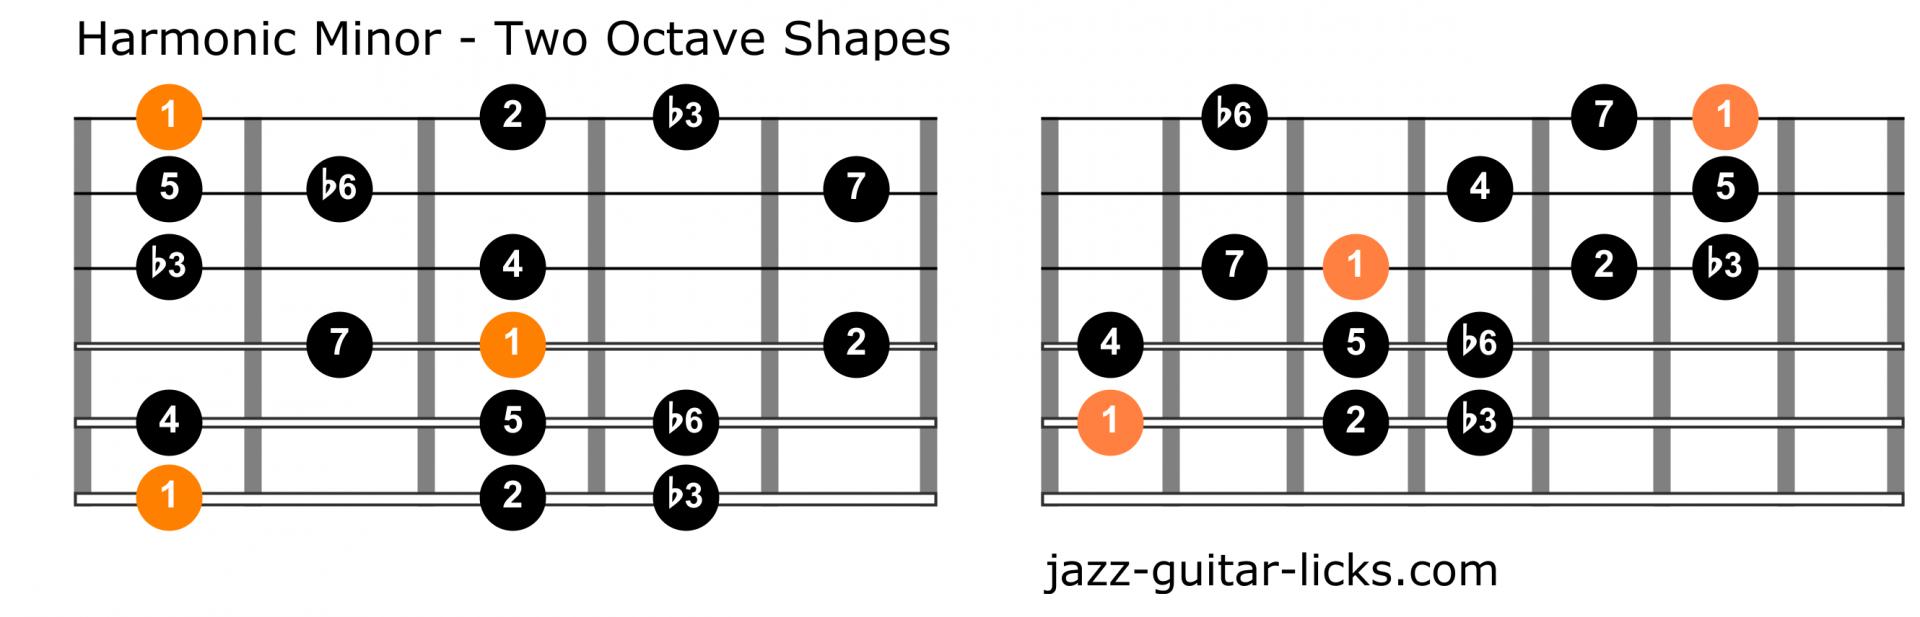 Harmonic minor scale guitar chart